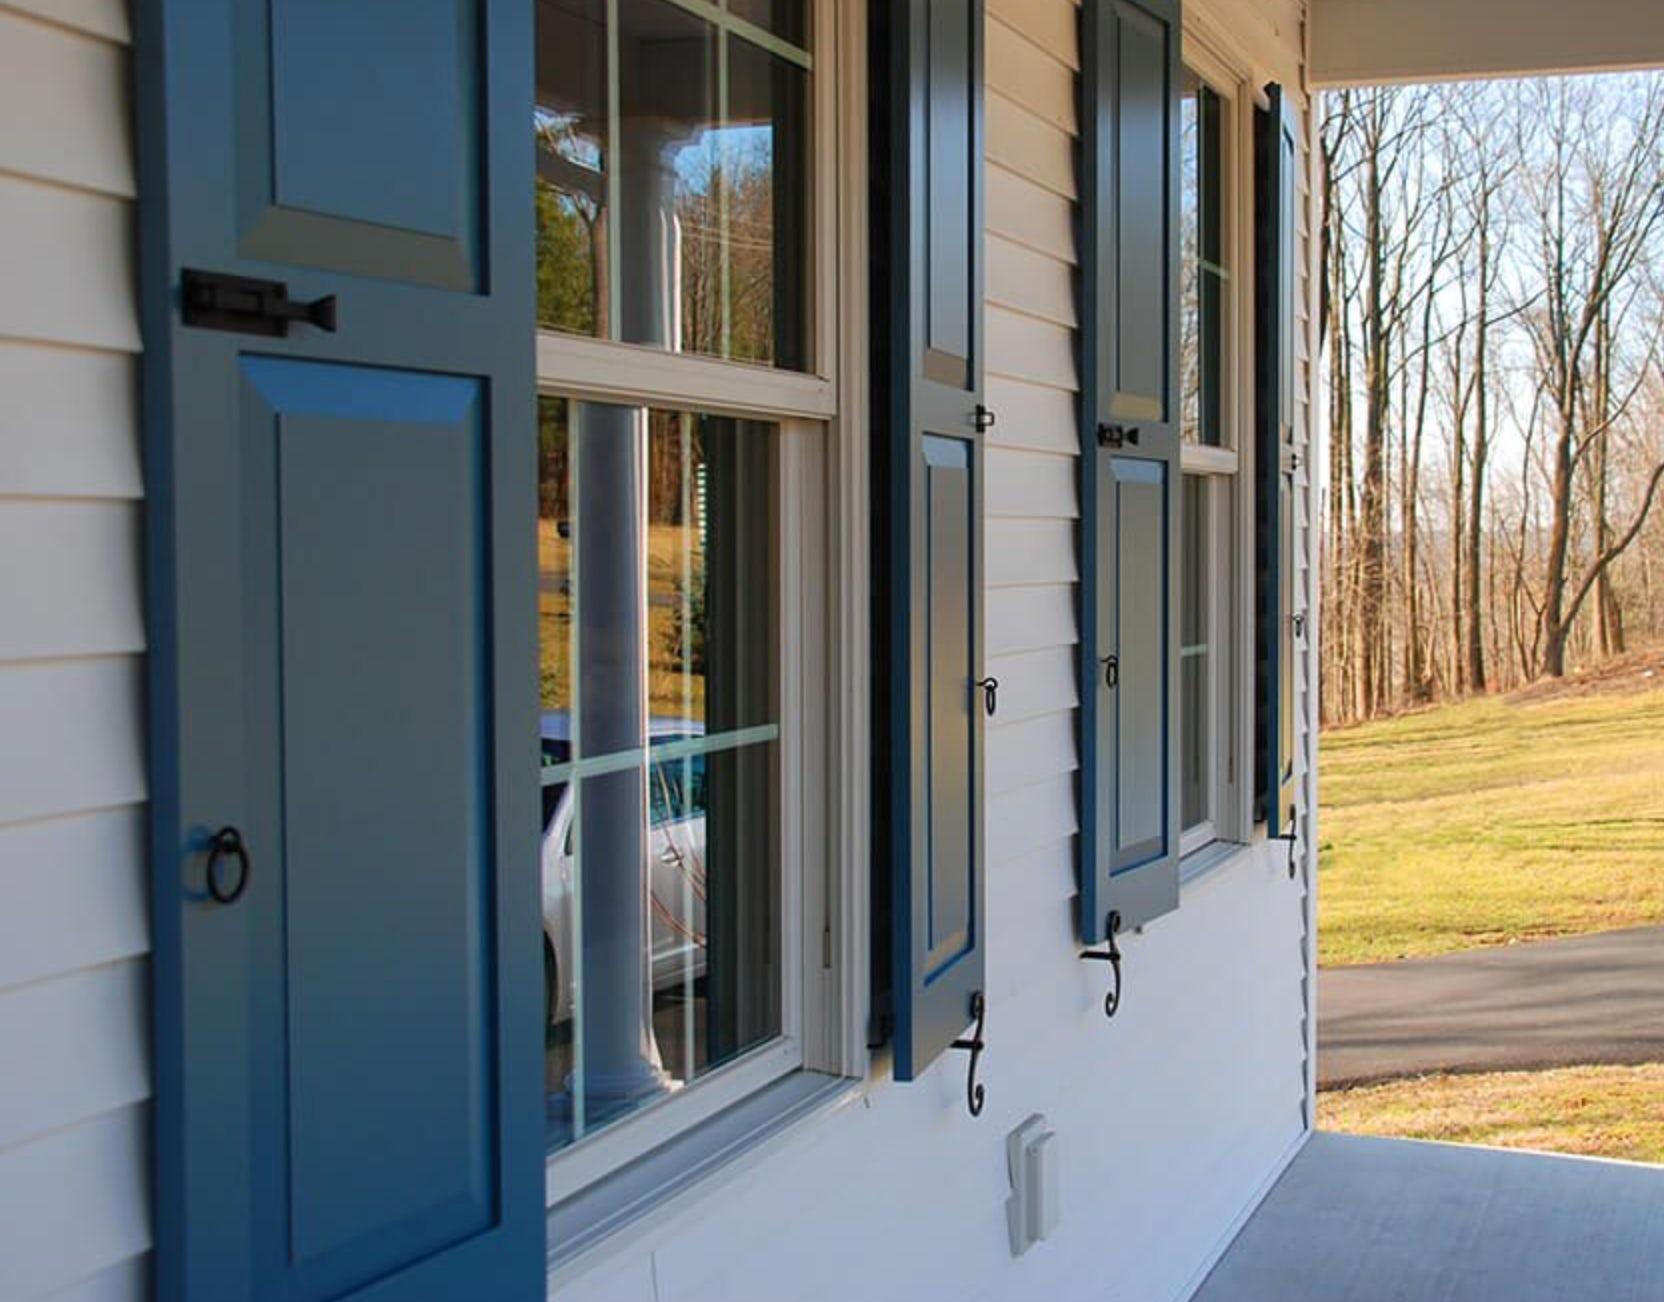 architecturally correct shutter